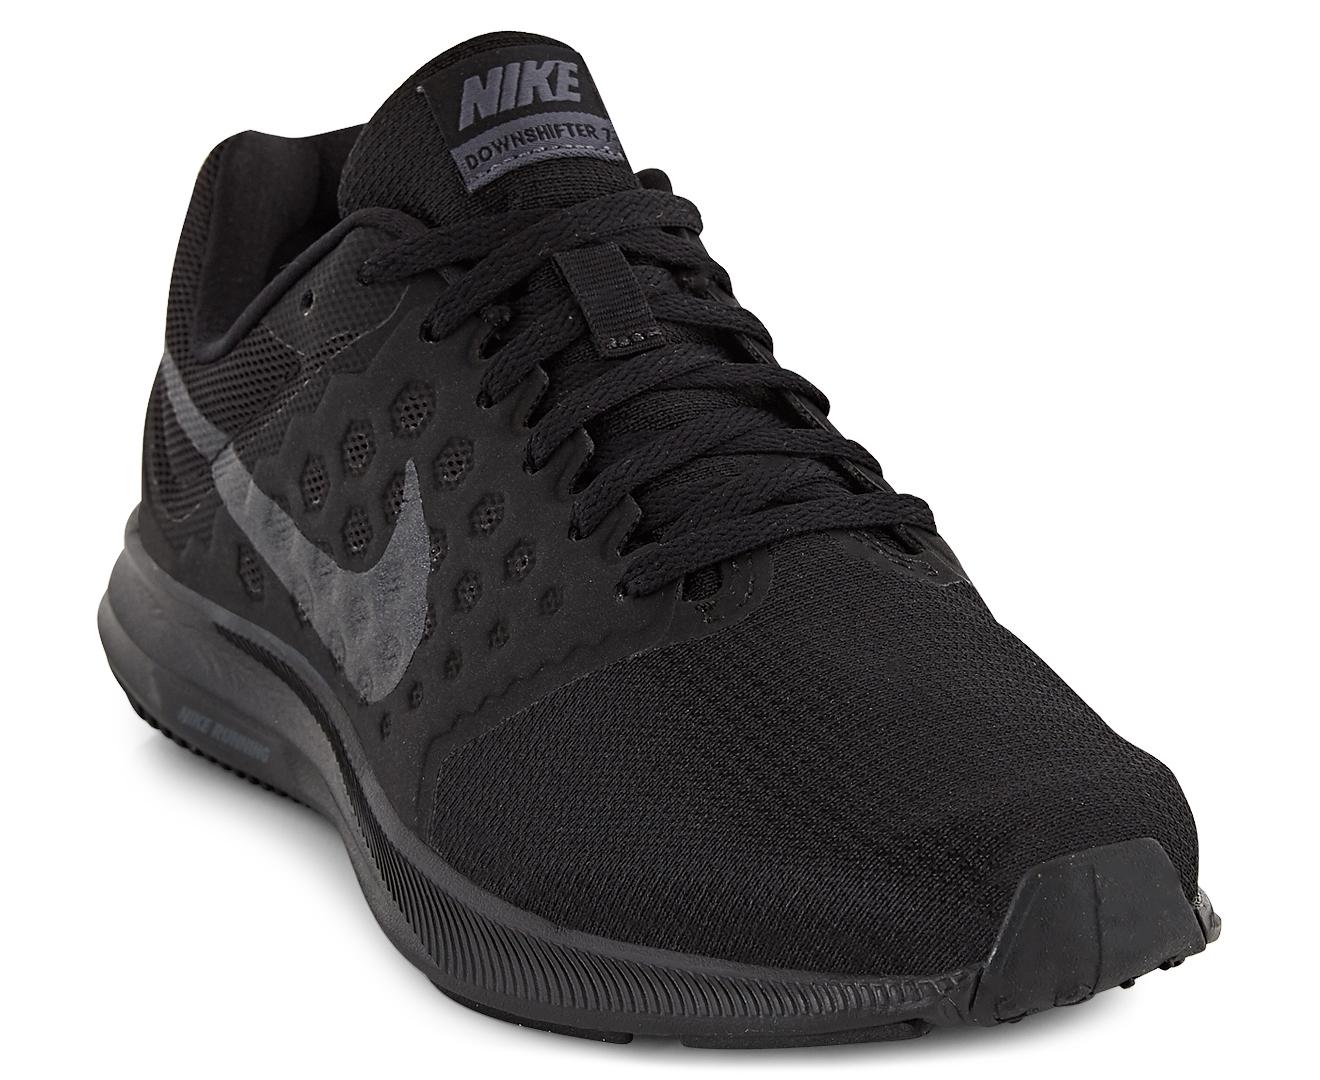 a67c6c42d0b Nike Women s Downshifter 7 Shoe - Black Metallic Hematite-Anthracite ...